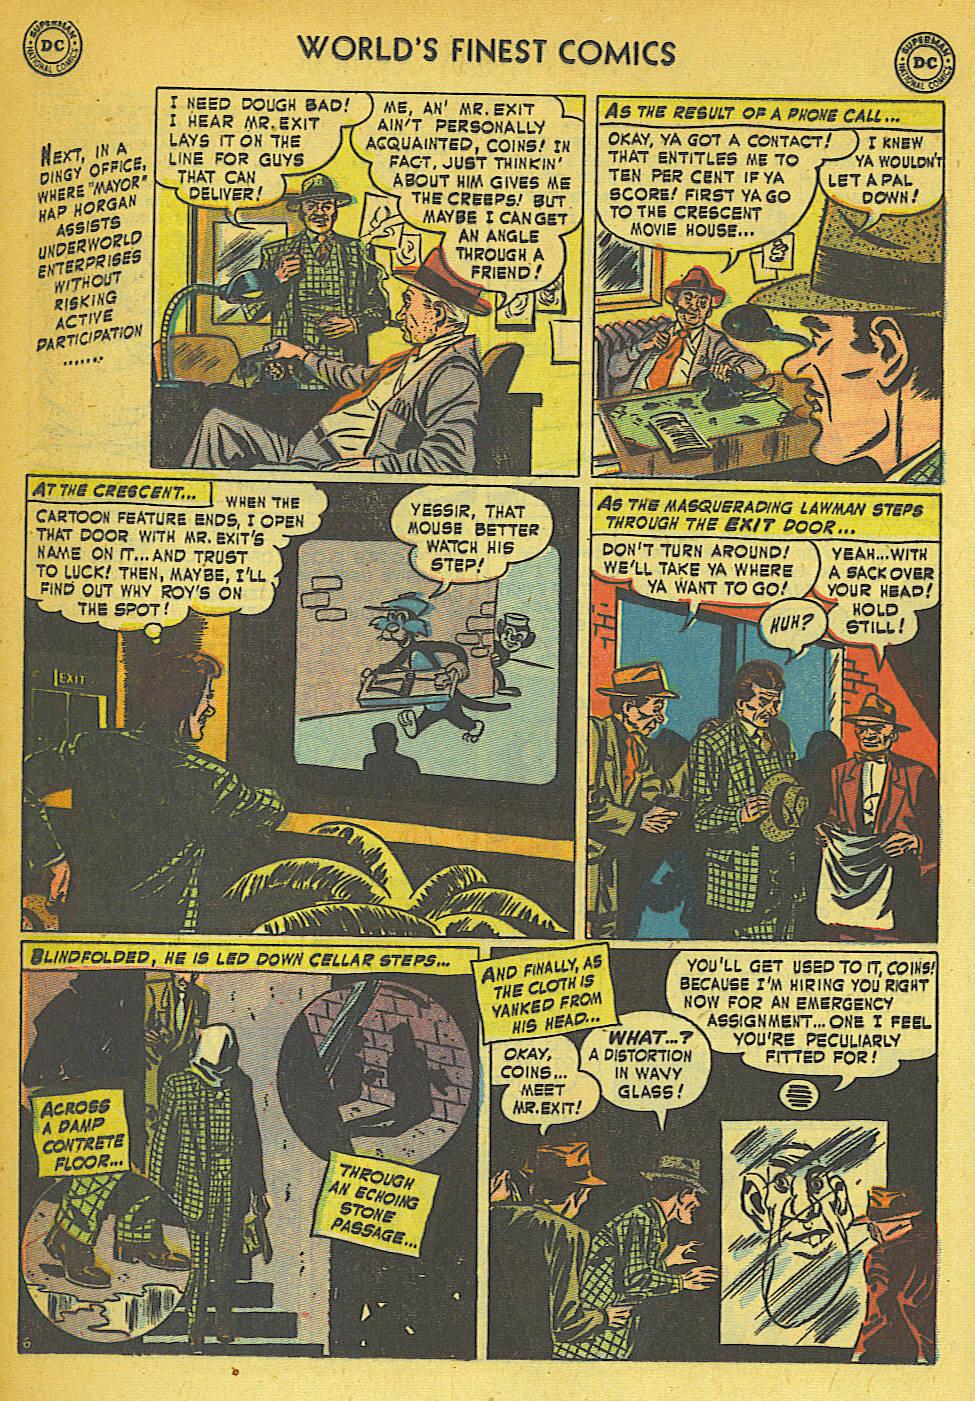 Read online World's Finest Comics comic -  Issue #57 - 22